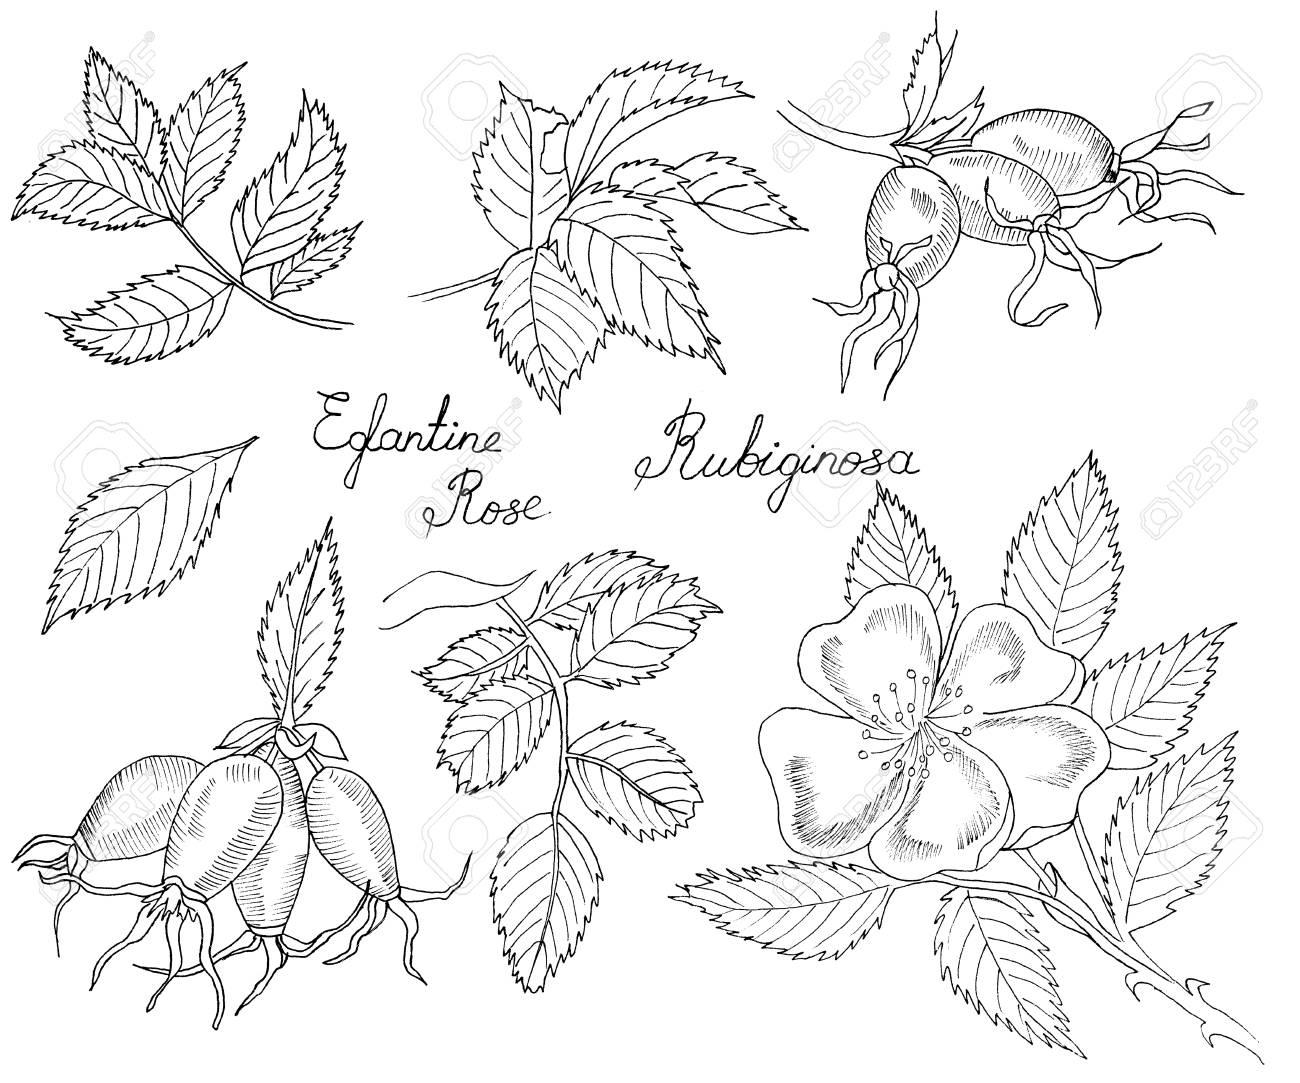 Graphic Branch Og Eglantine Rose Flower With Barries On White